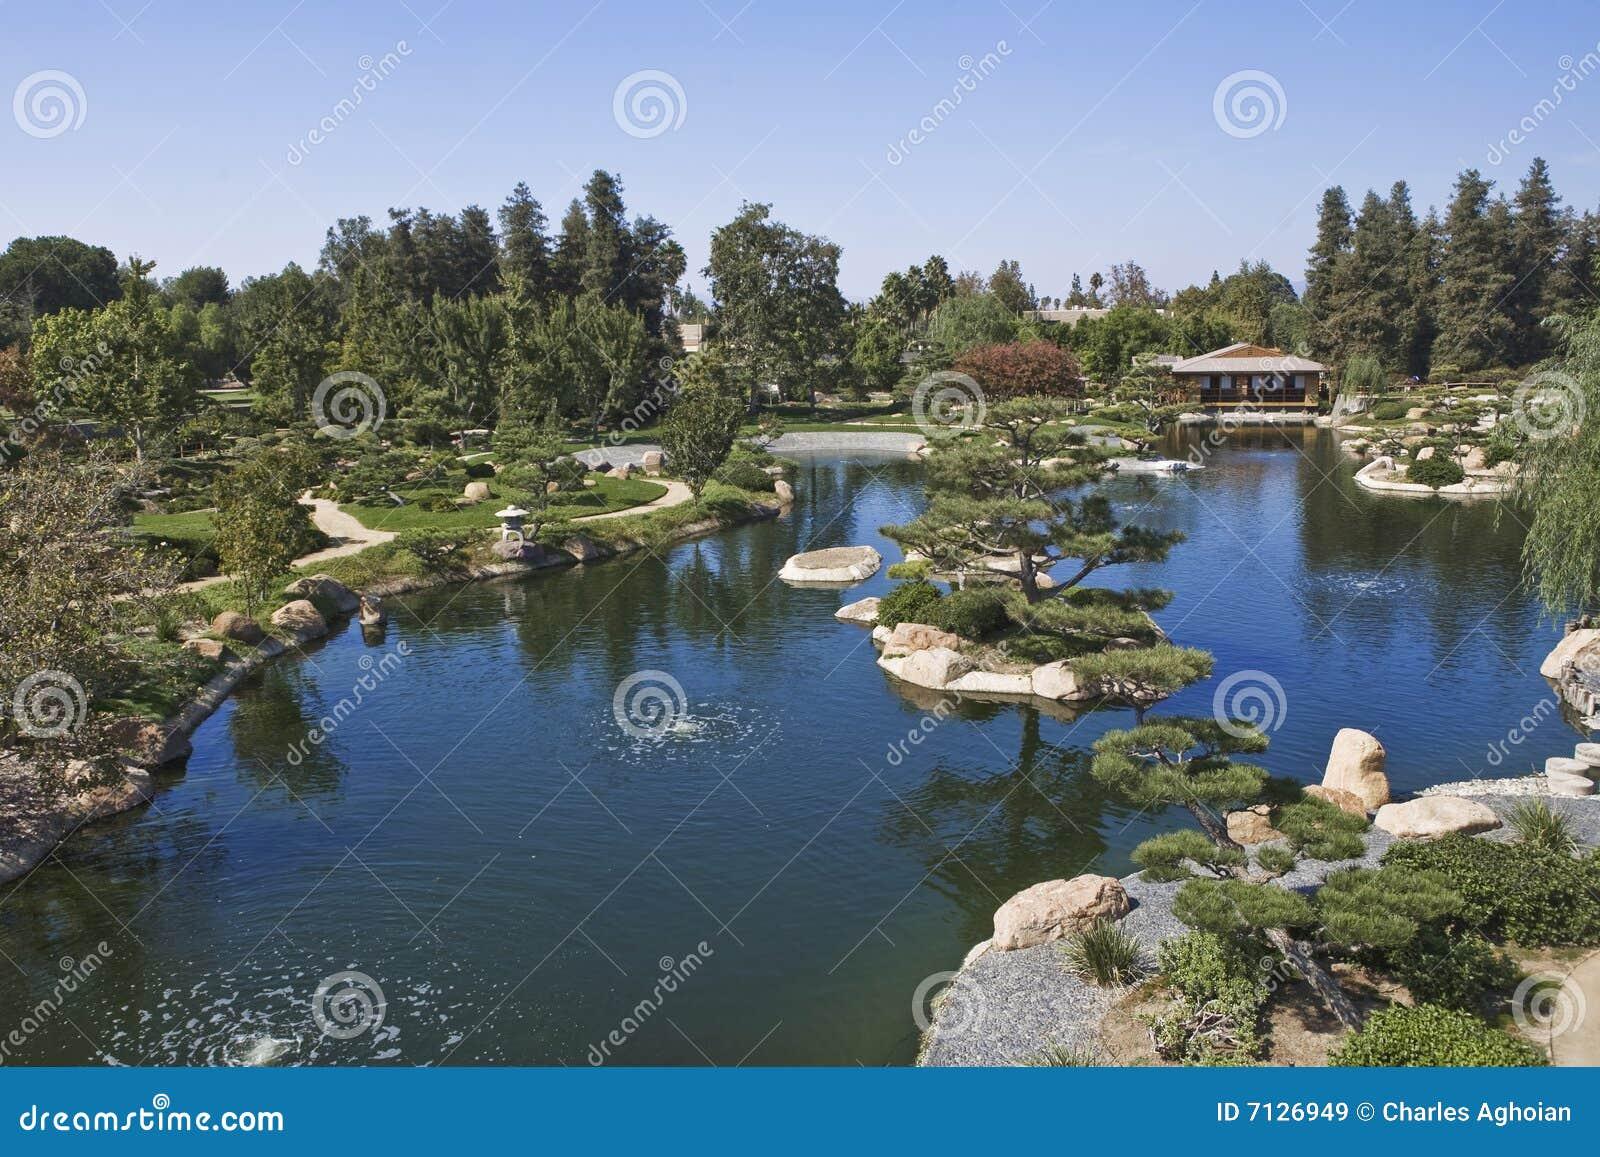 Giardini giapponesi immagine stock immagine di arbusto for Giardini giapponesi